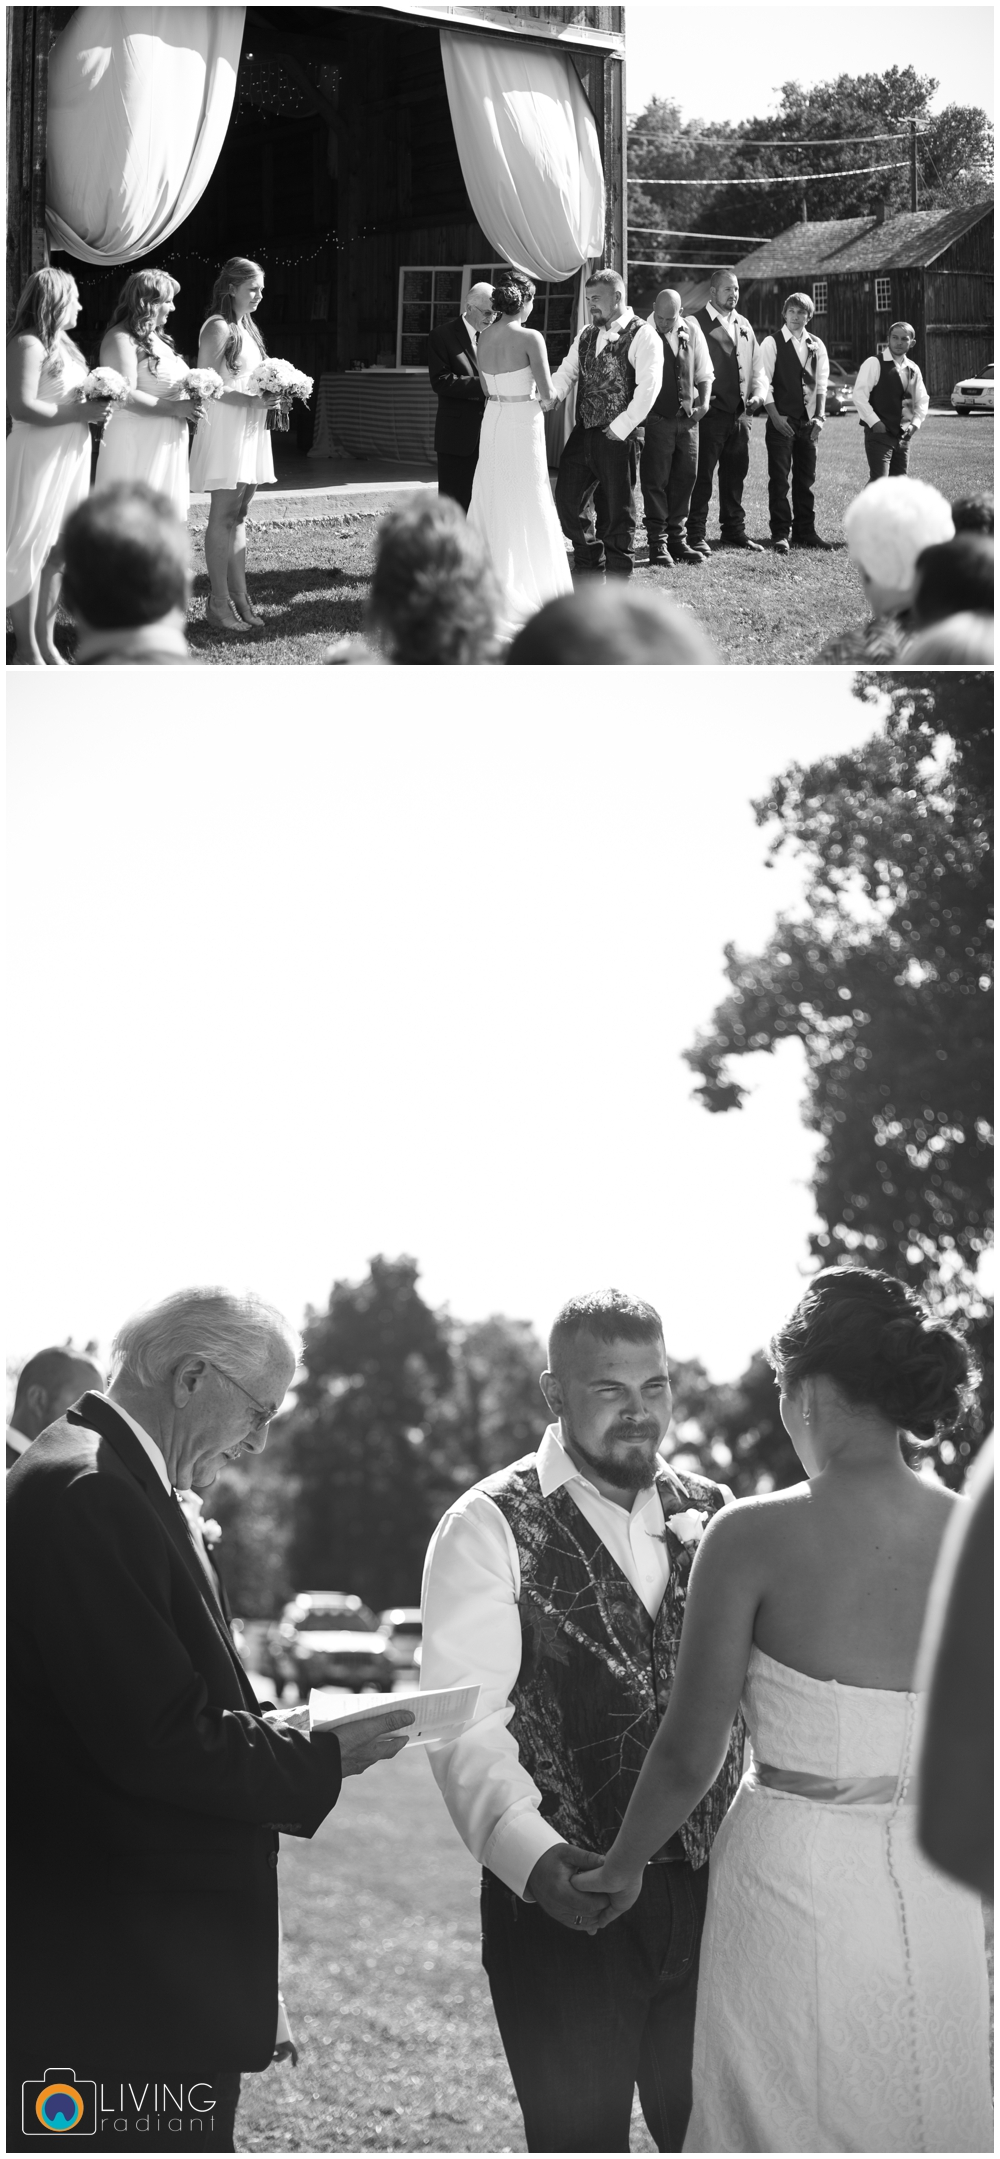 shannon-bill-bowers-wedding-living-radiant-photography-union-mills-homestead_0013.jpg